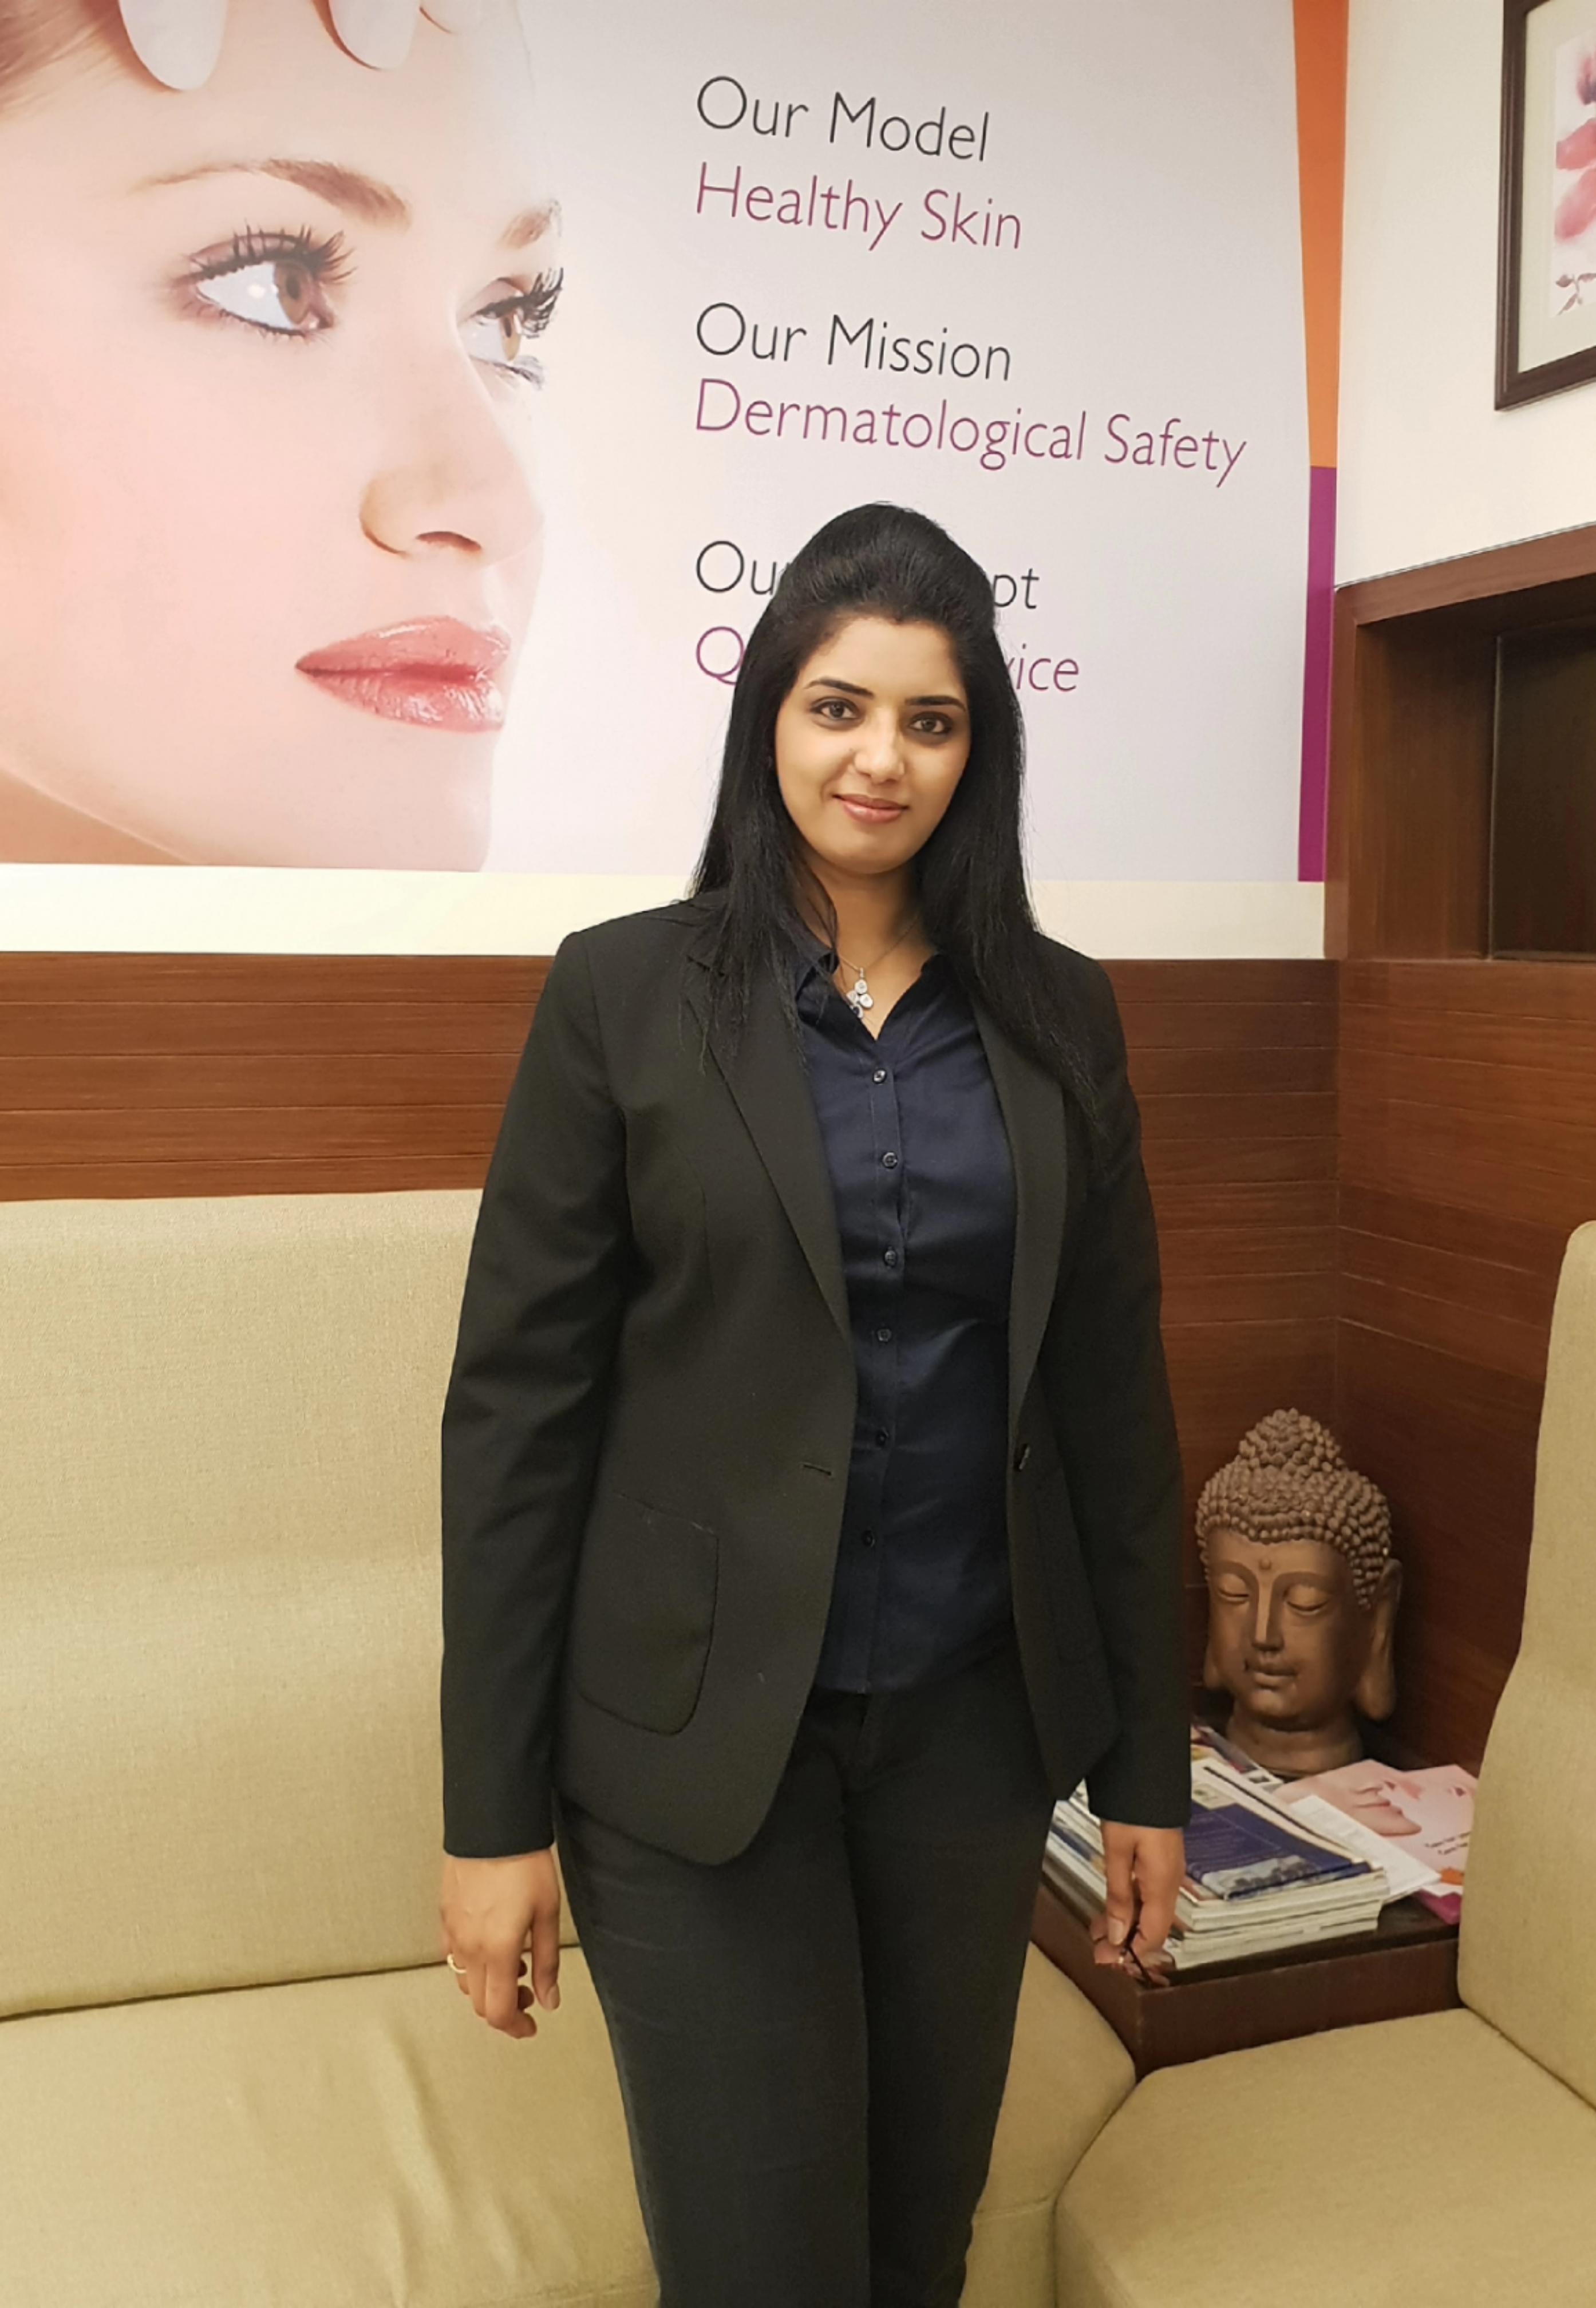 Dr. Satish Rudrappa